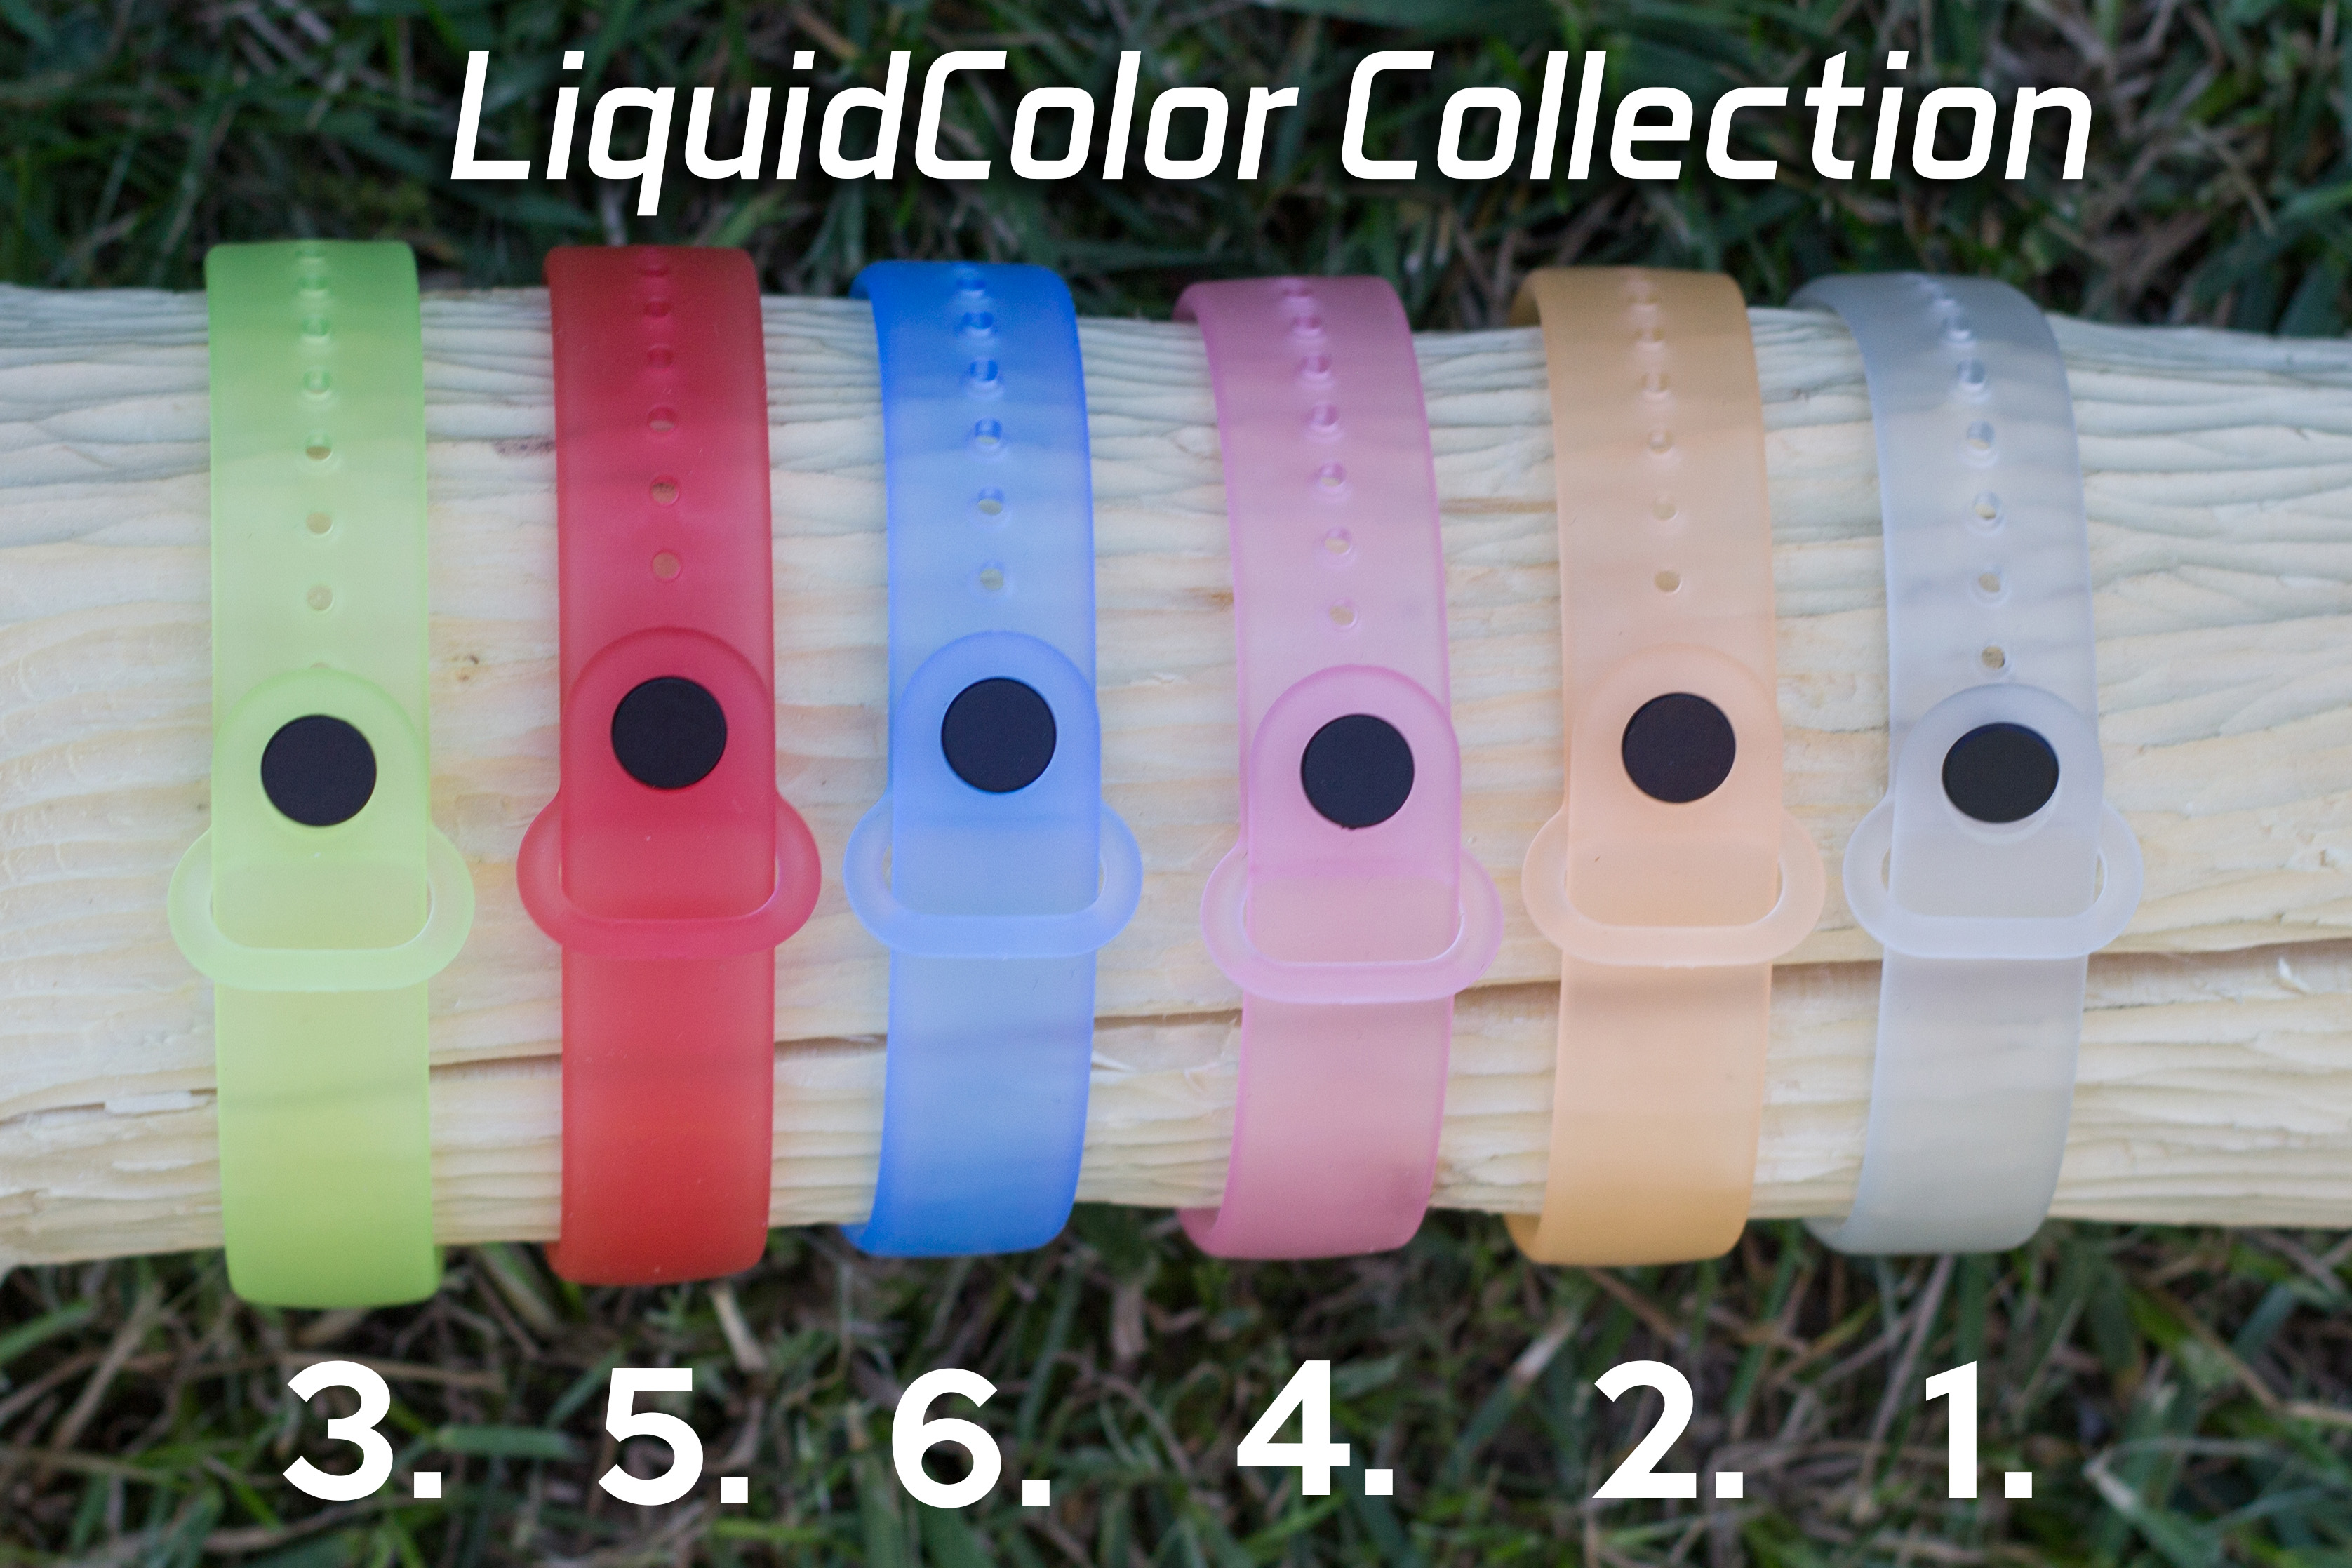 Mi Band 3 szilikon pánt - LiquidColor 6